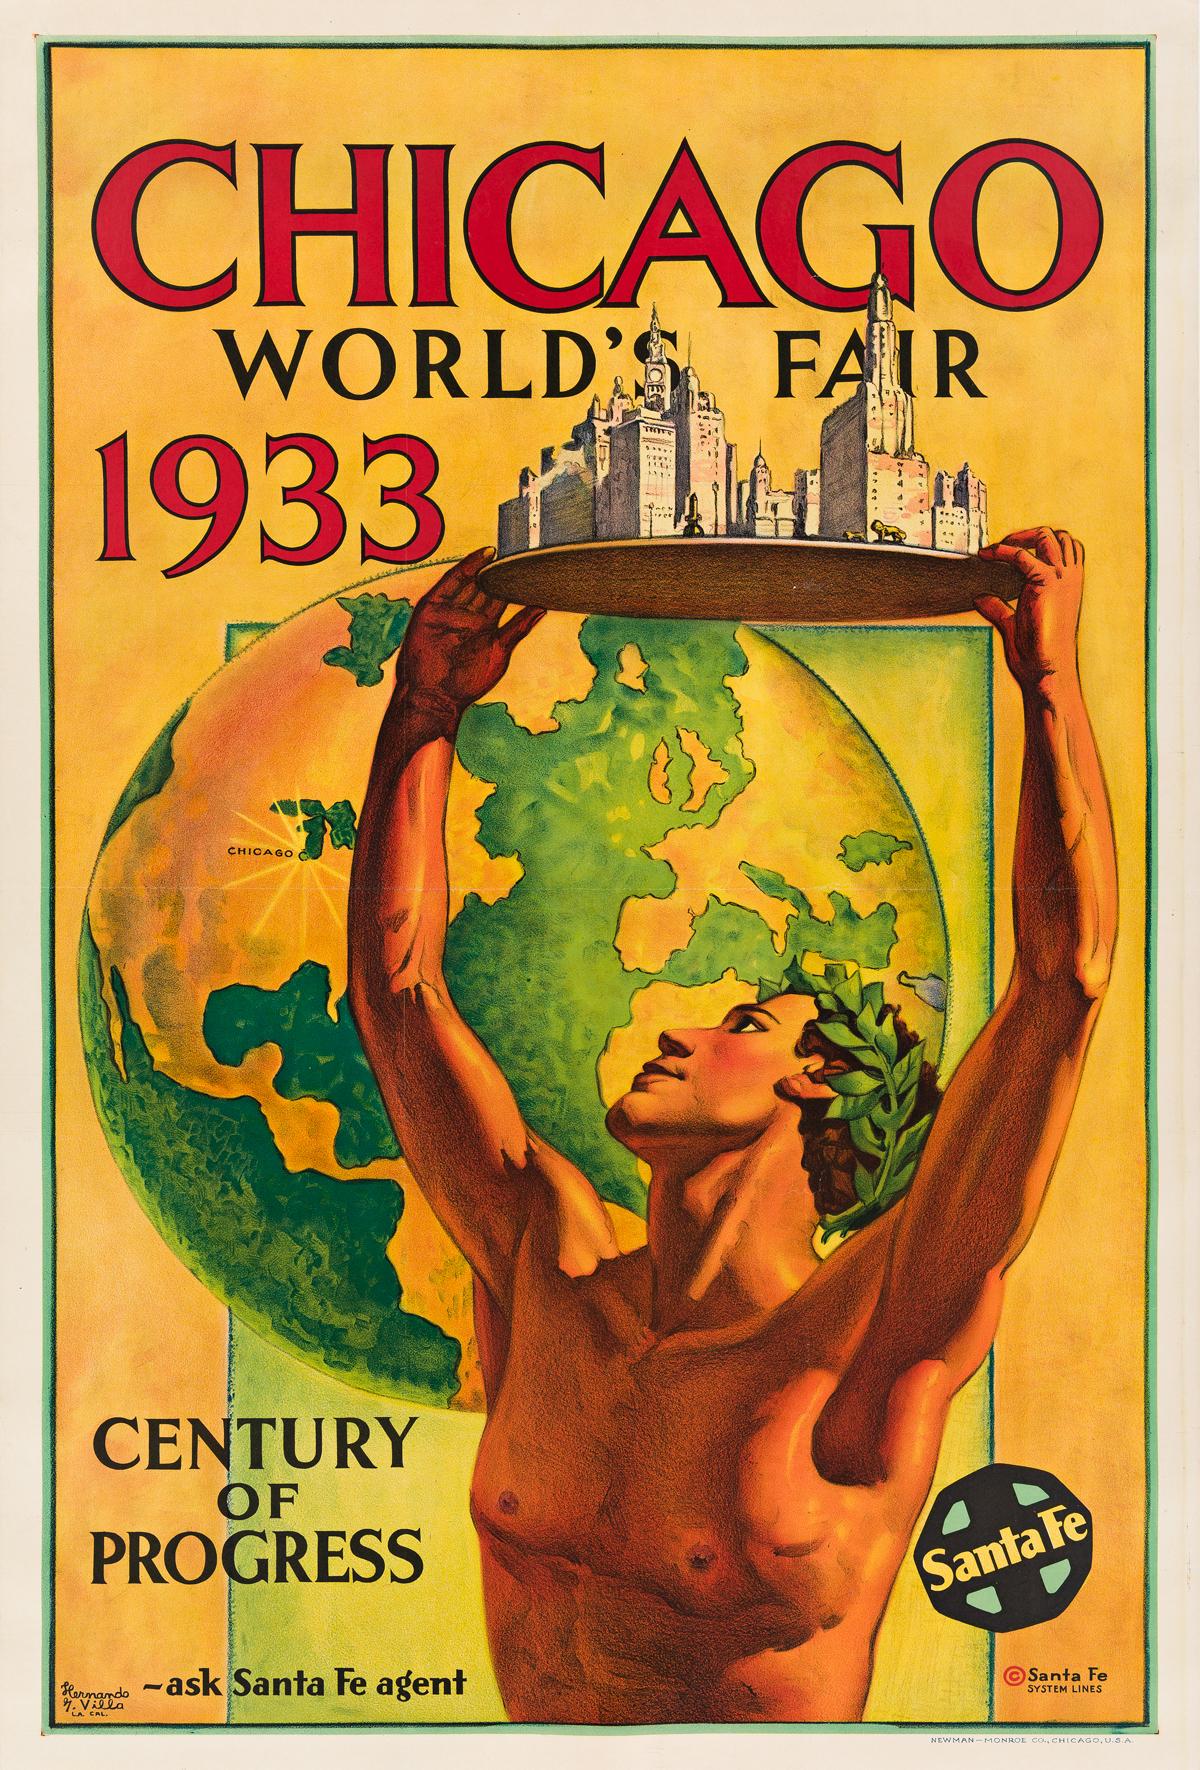 Hernando G. Villa (1881-1952).  CHICAGO WORLDS FAIR / CENTURY OF PROGRESS. 1933.